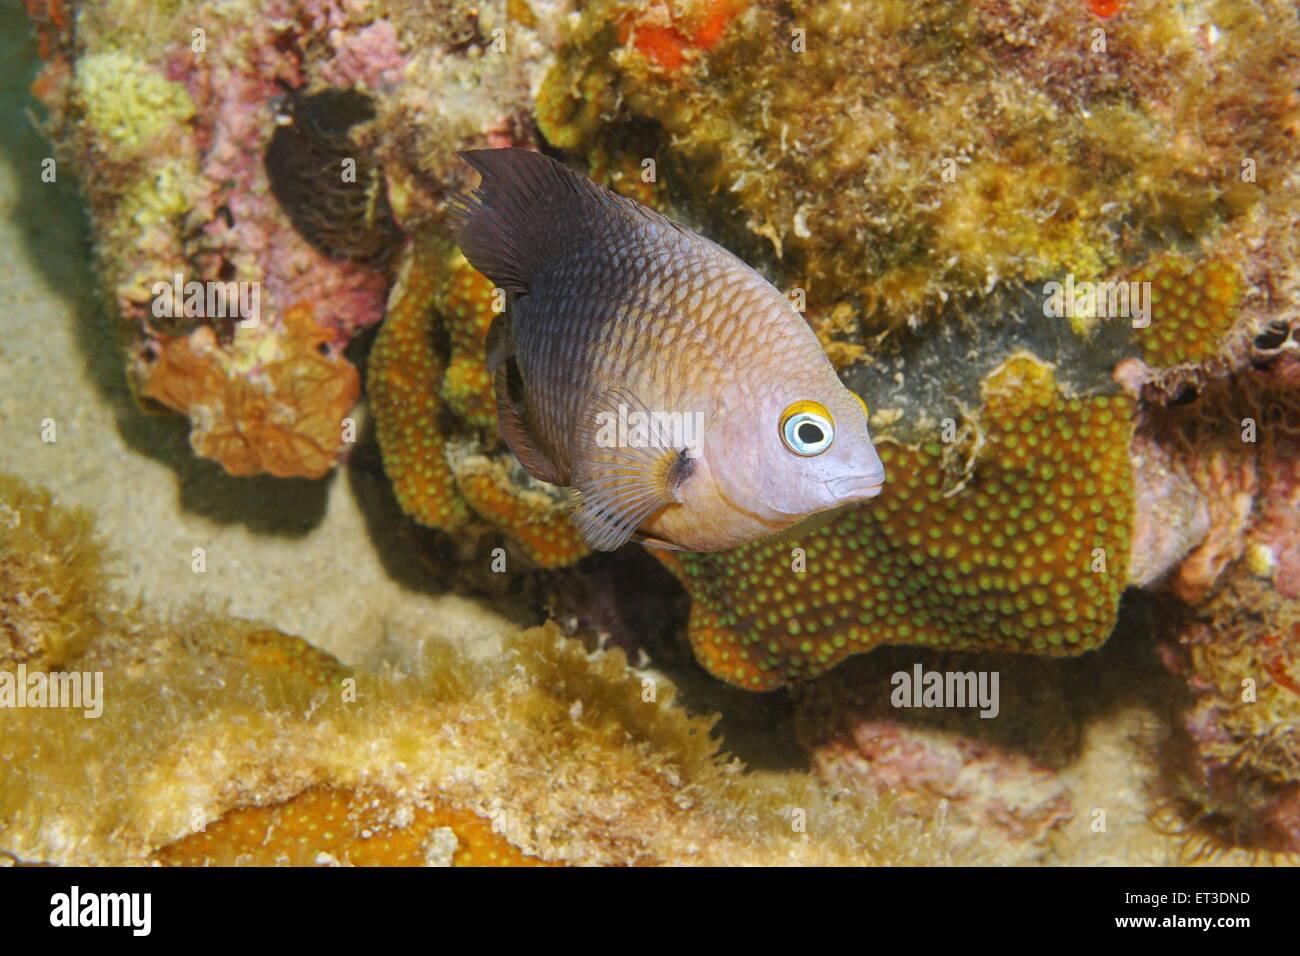 Caribbean reef fish underwater, Threespot damselfish, Stegastes planifrons Stock Photo